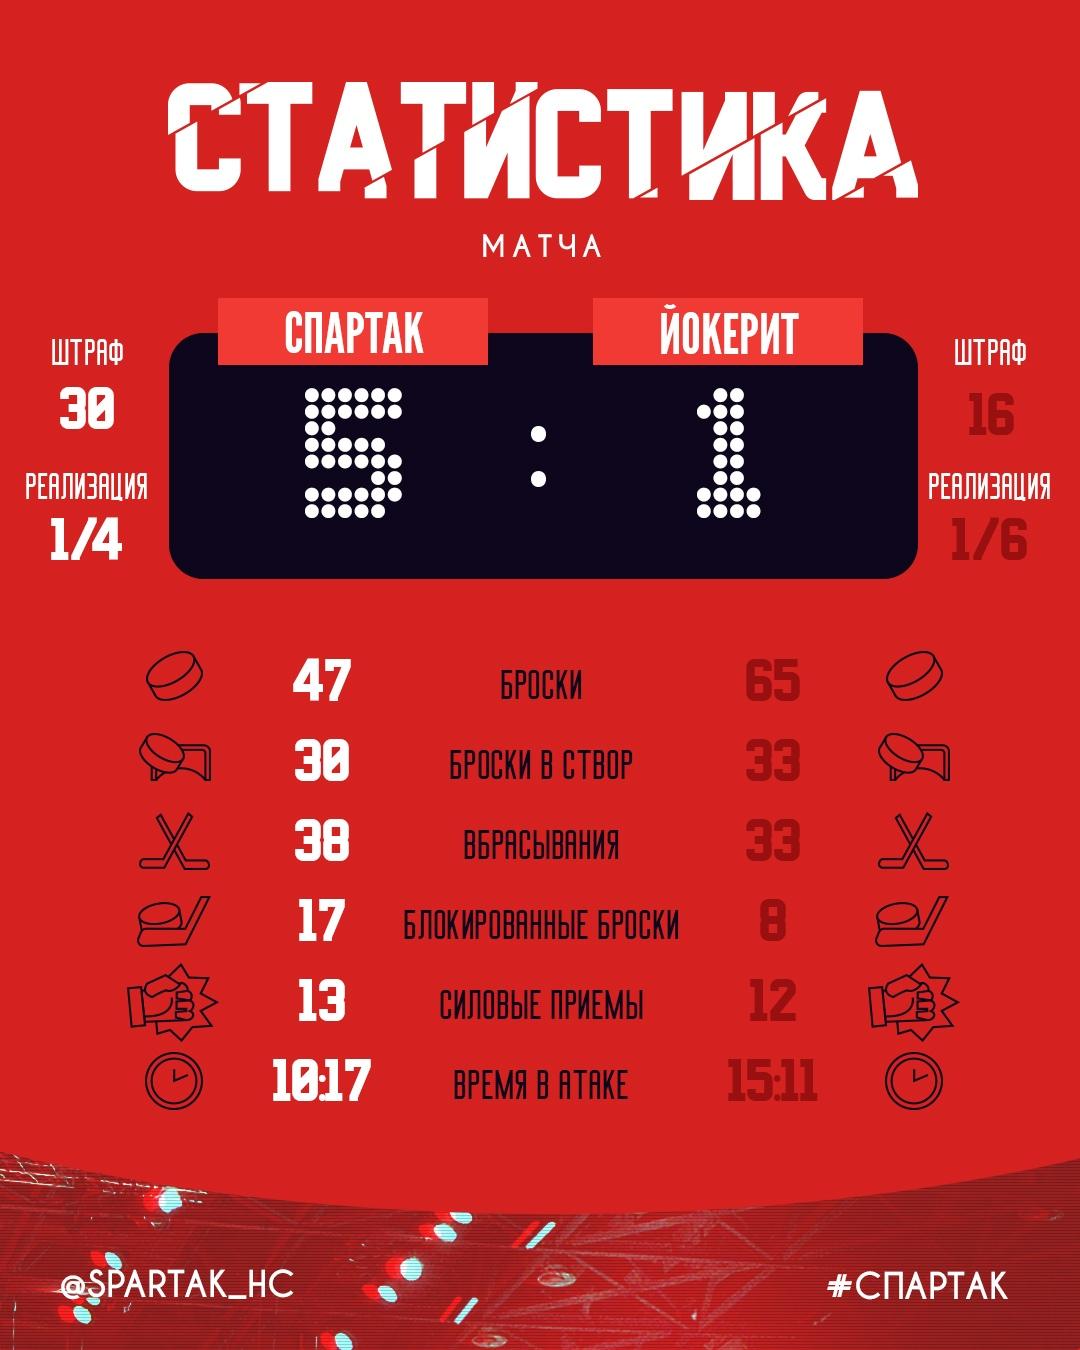 Статистика матча «Спартак» - «Йокерит» 5:1